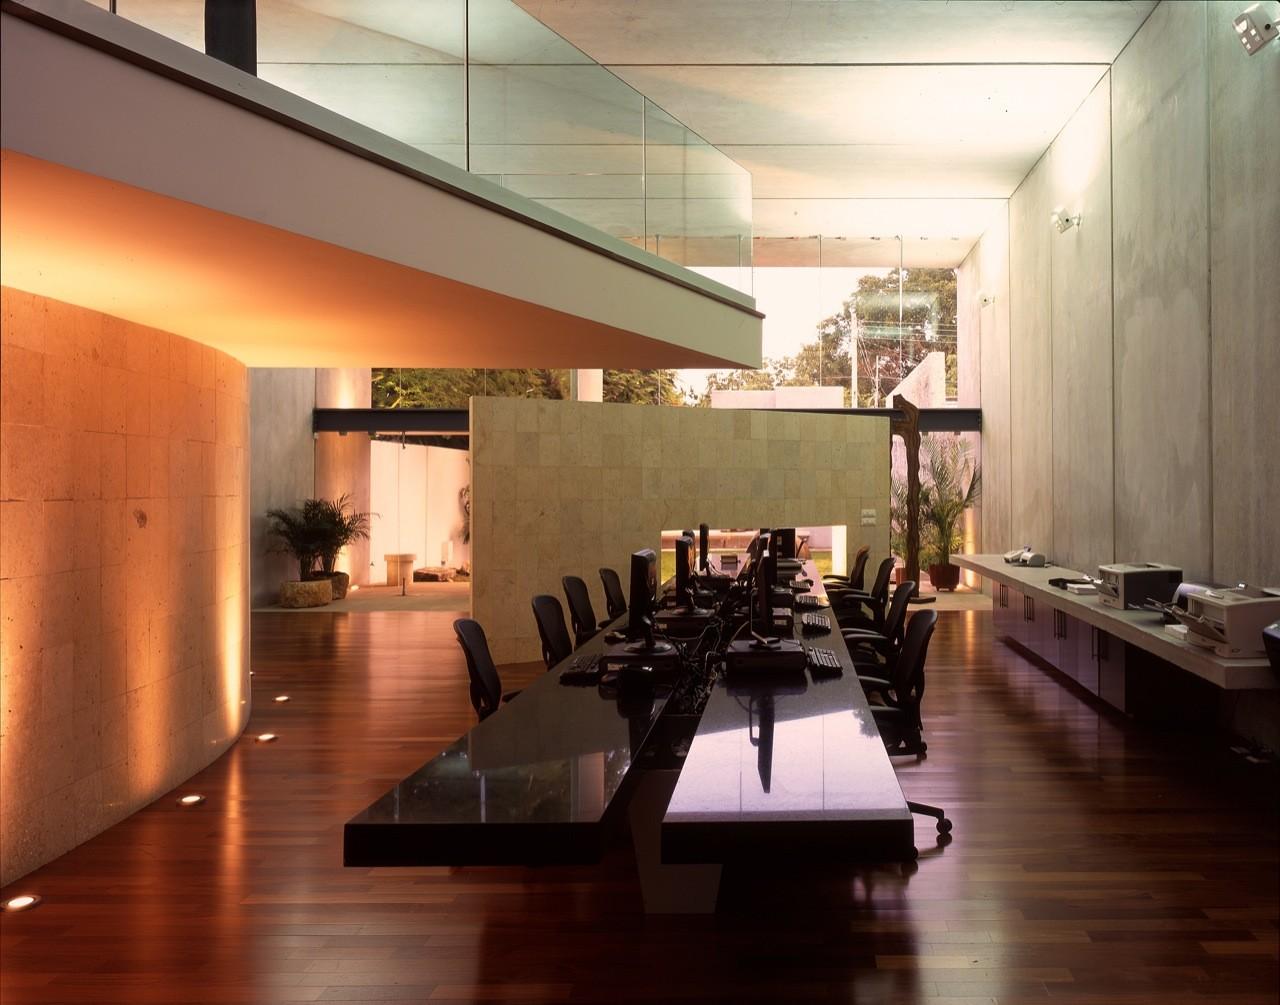 Galer a de estudio de arquitectos mu oz arquitectos 11 - Estudio 3 arquitectos ...